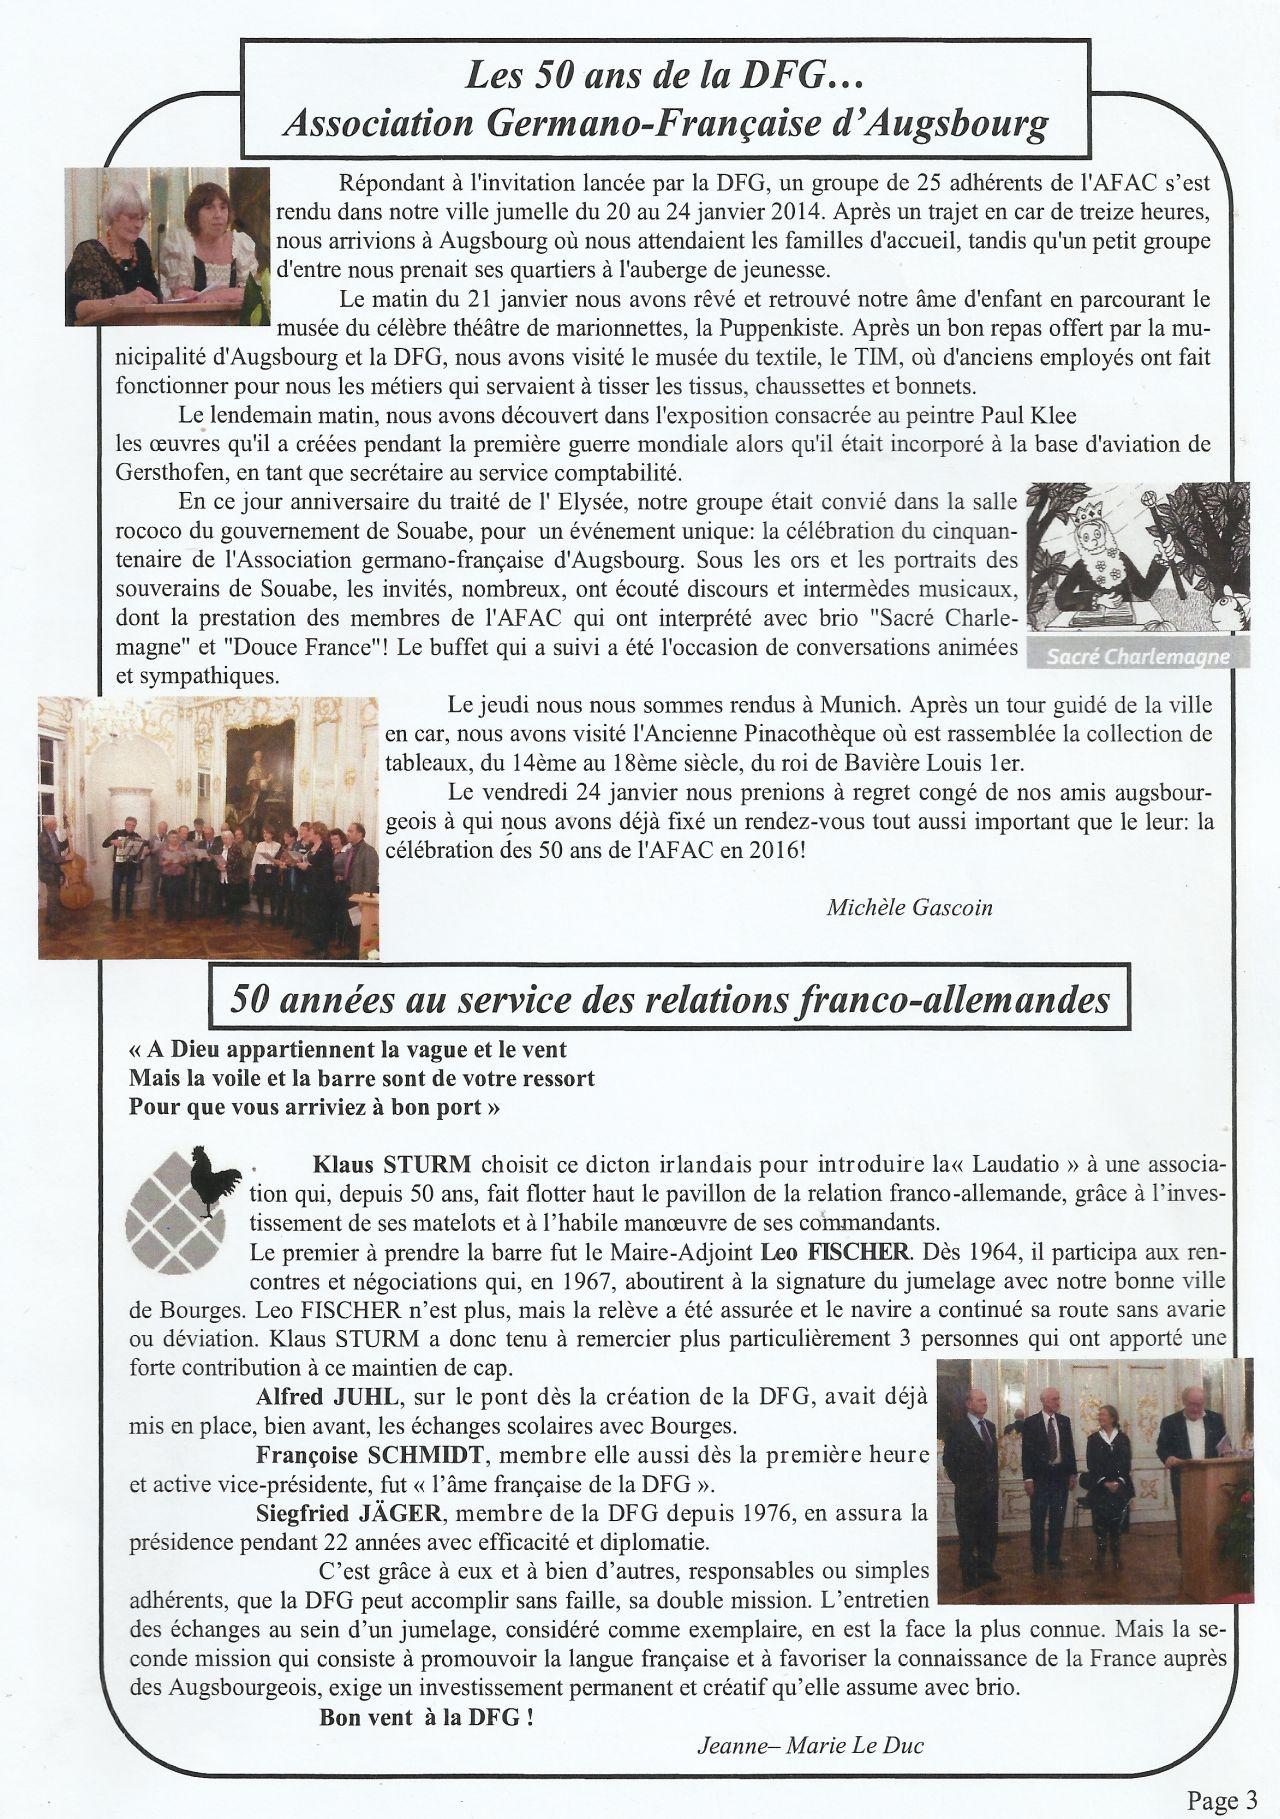 22.01.2014: 50 Jahre Deutsch-Französische Gesellschaft à Le Vent Dans Les Voiles Chanson